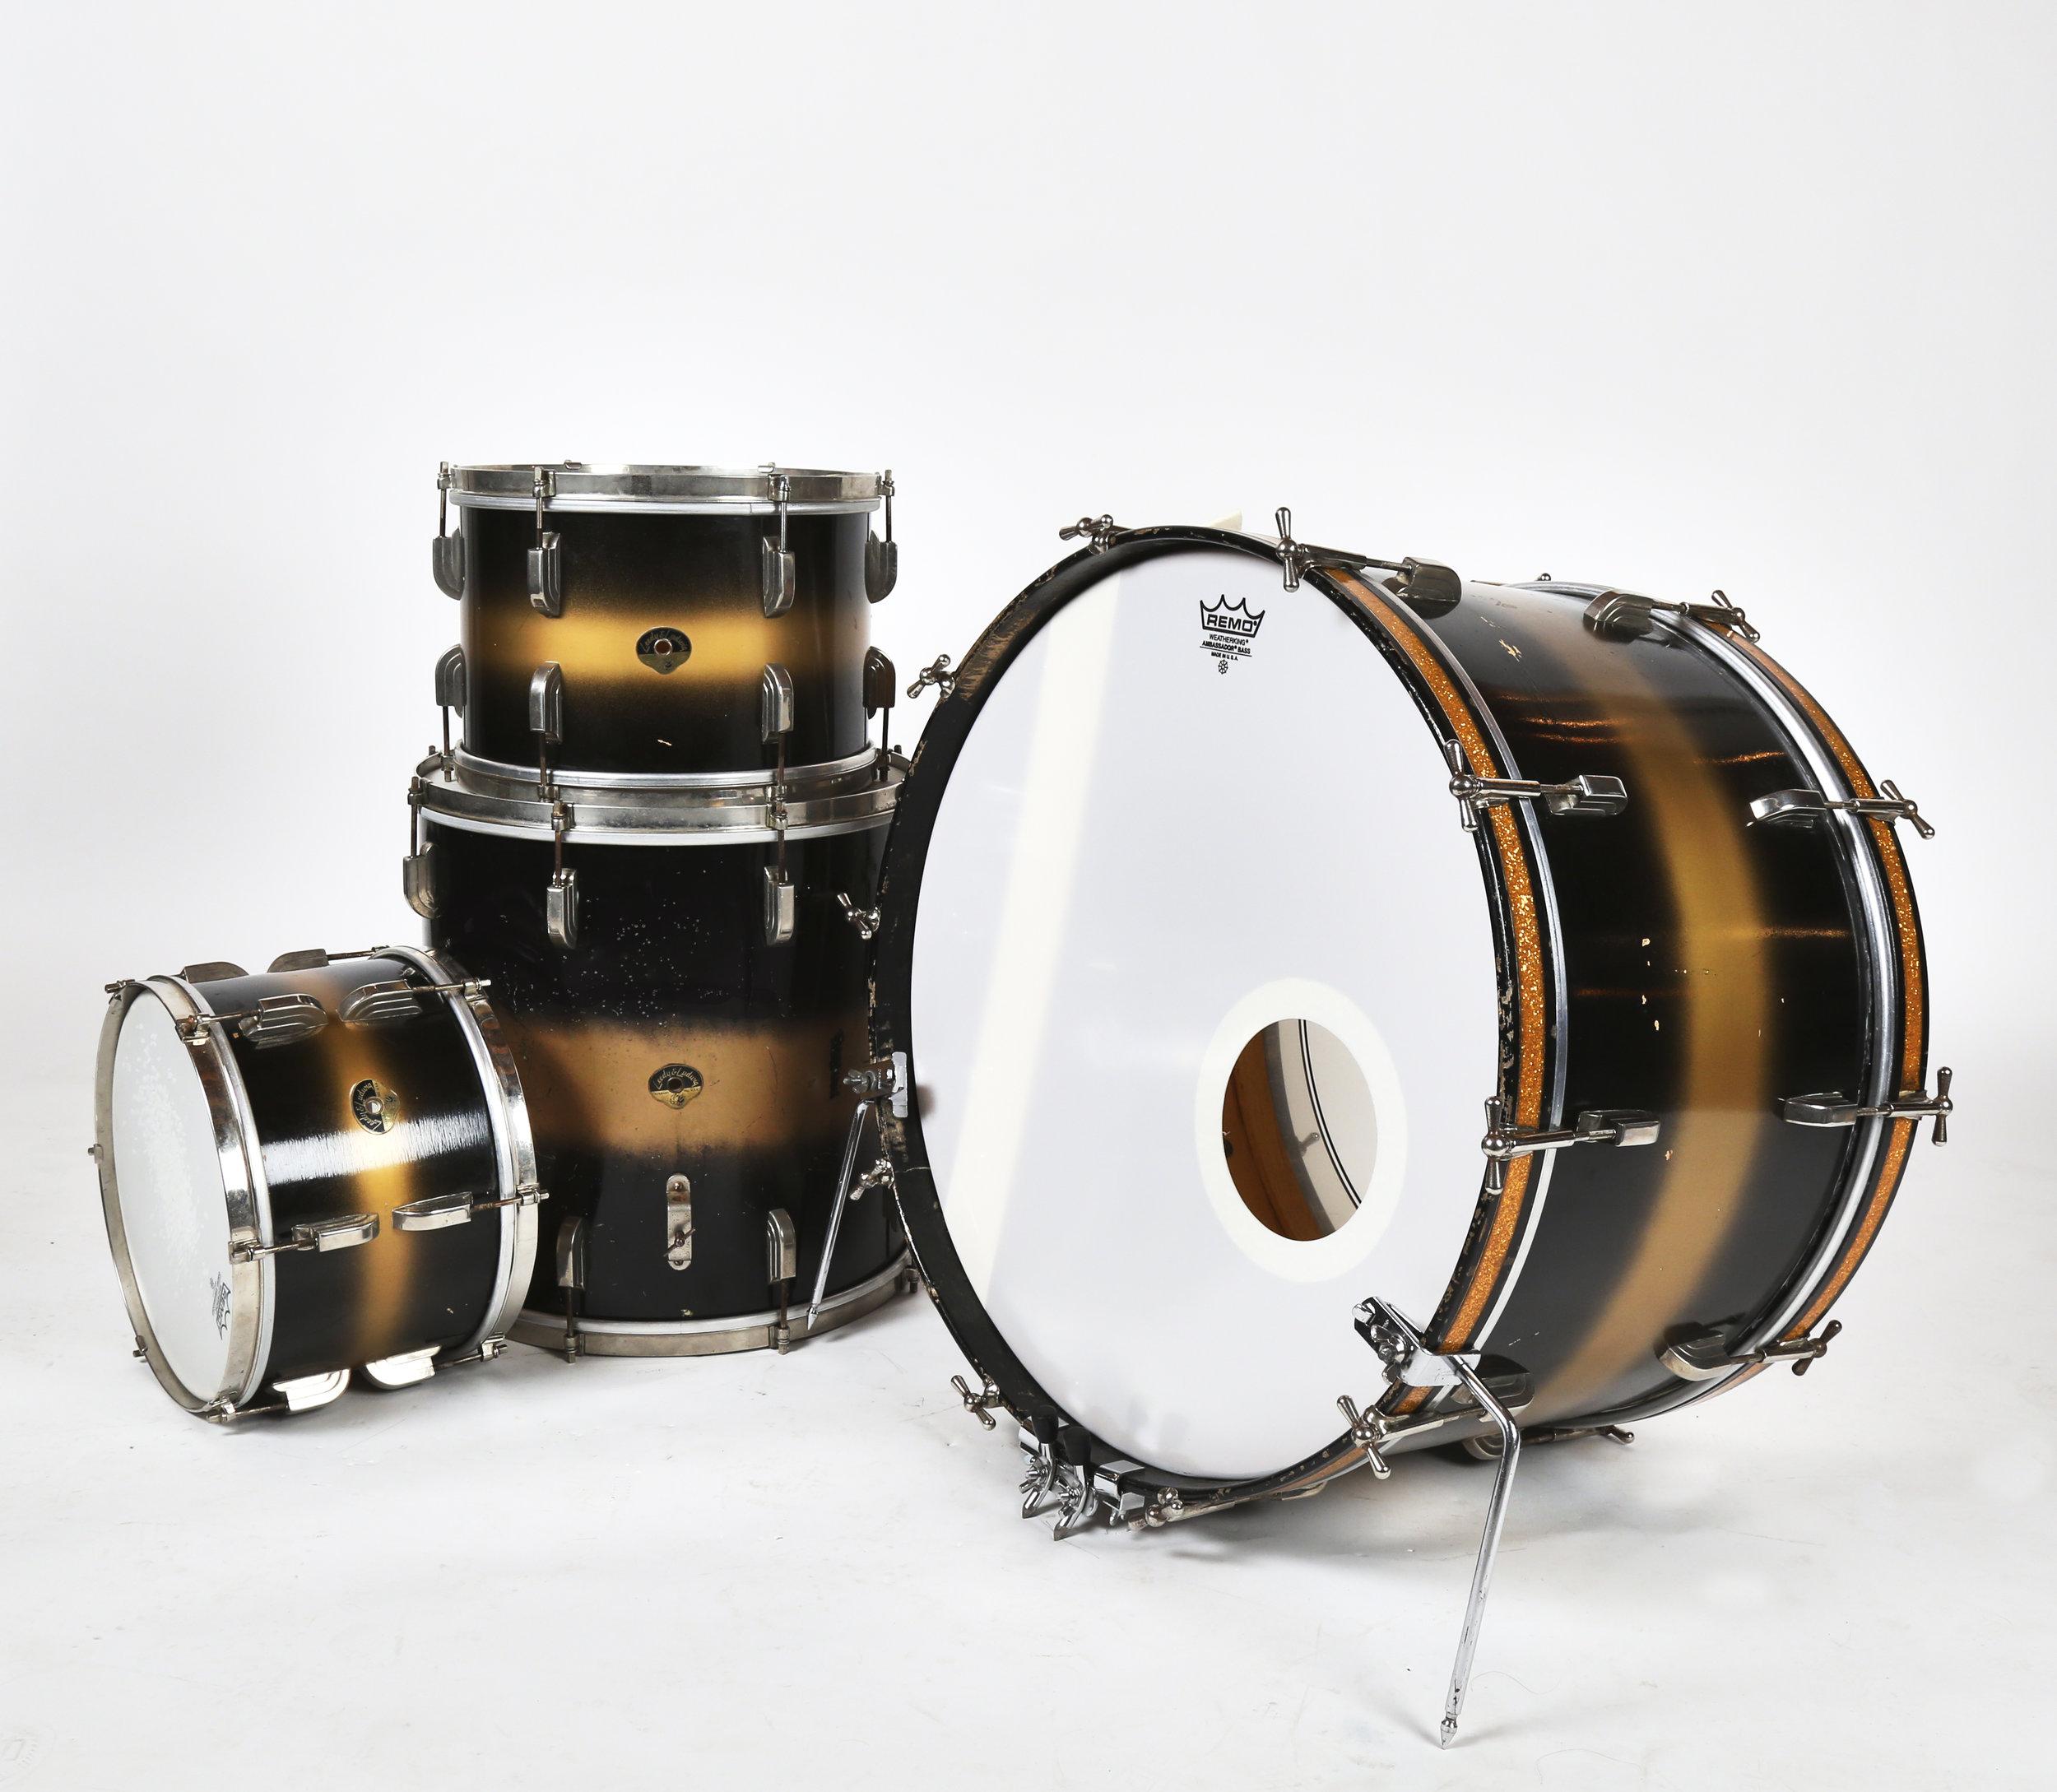 Dorio Vintage Drum_53 Leedy Ludwig_1828.jpg